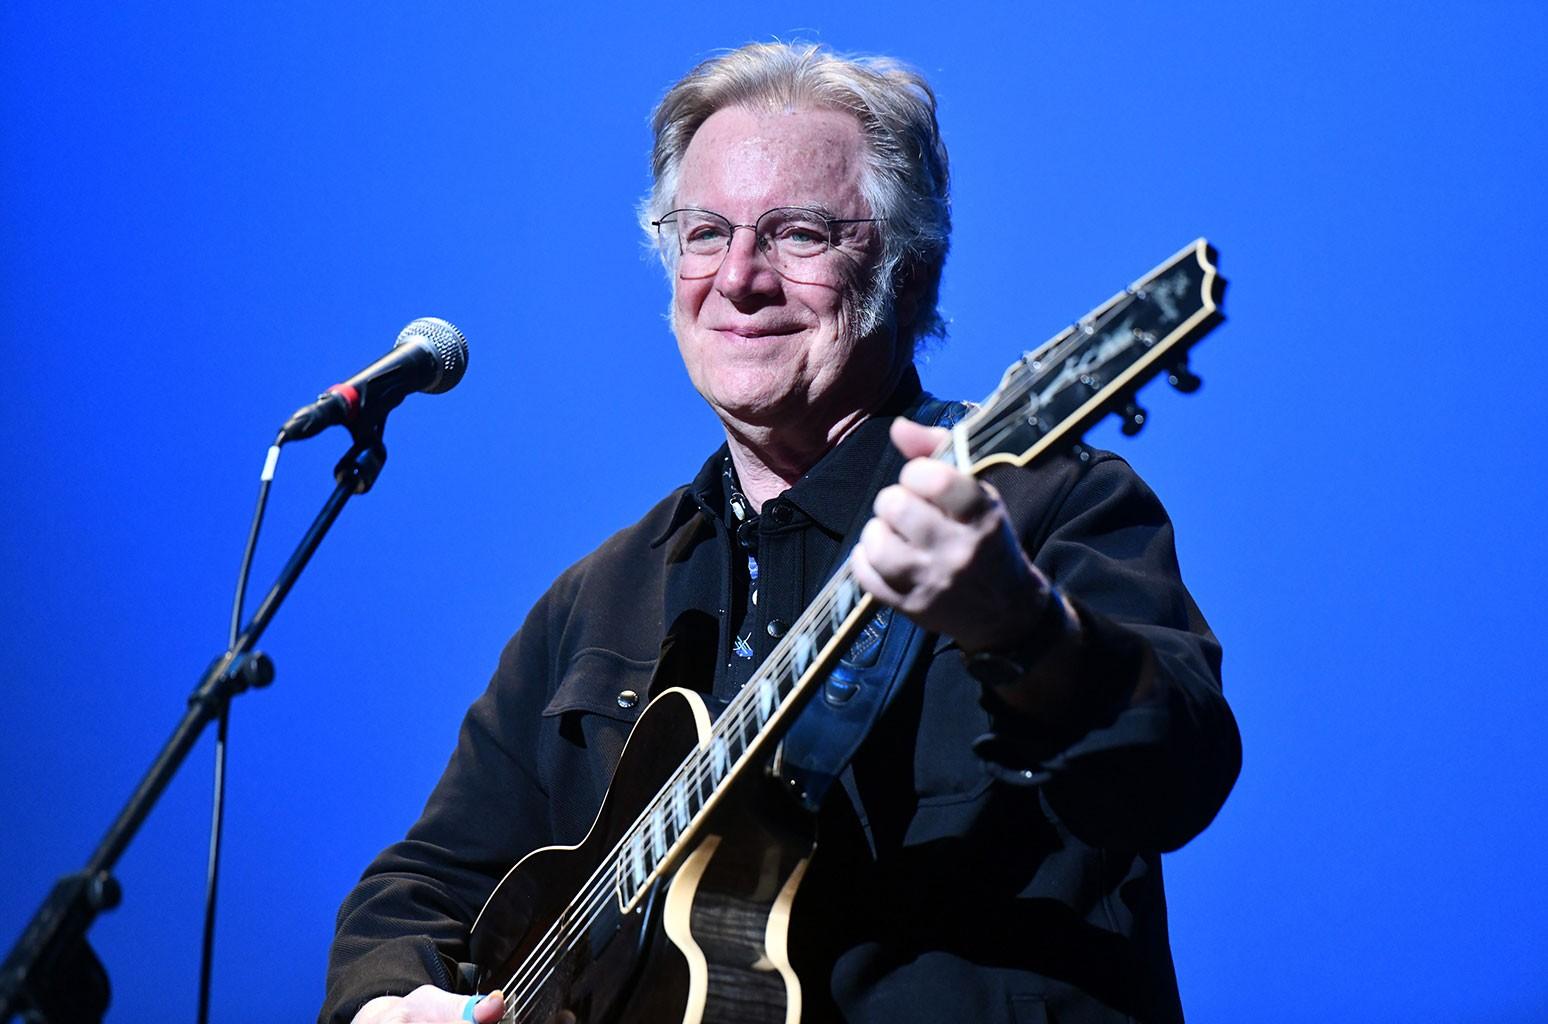 Live At The Hall: John Sebastian